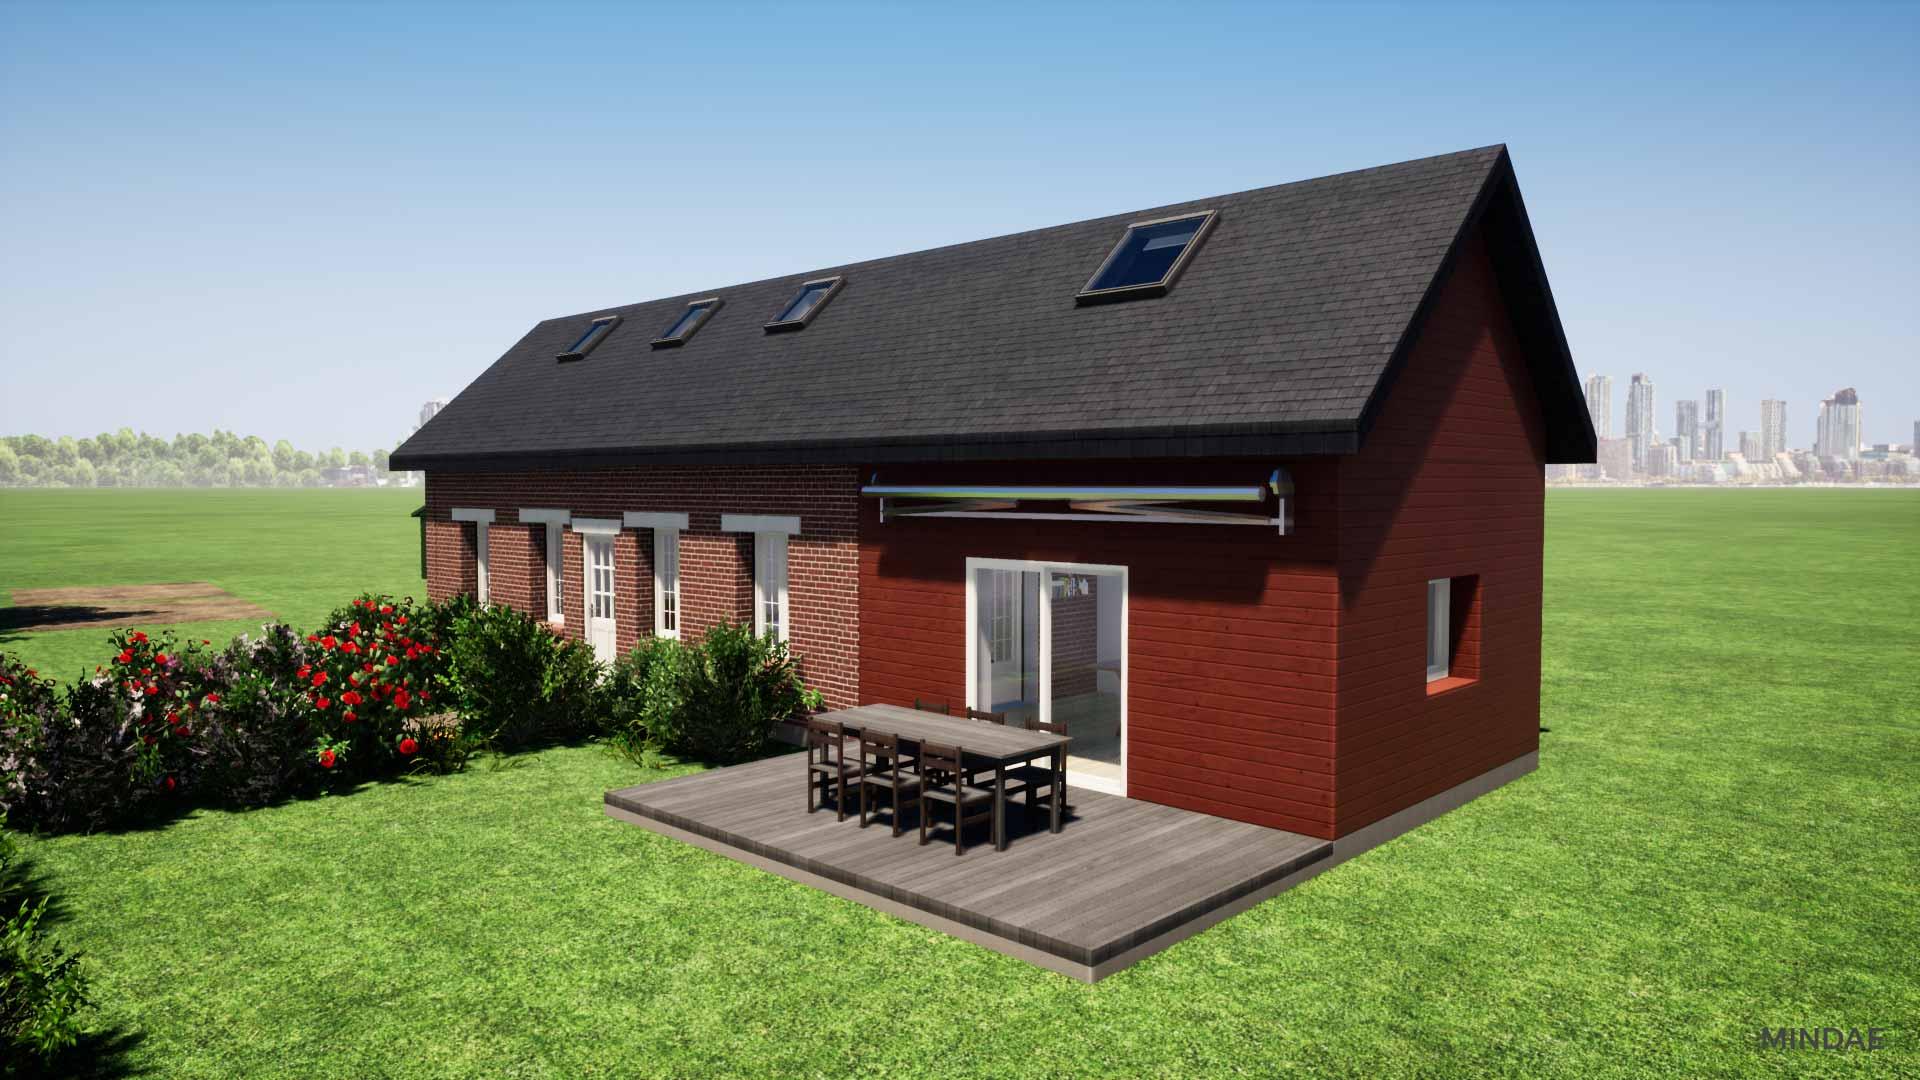 Mindae_3D_maison_extension_bois_Cambremer_terrasse-(4)